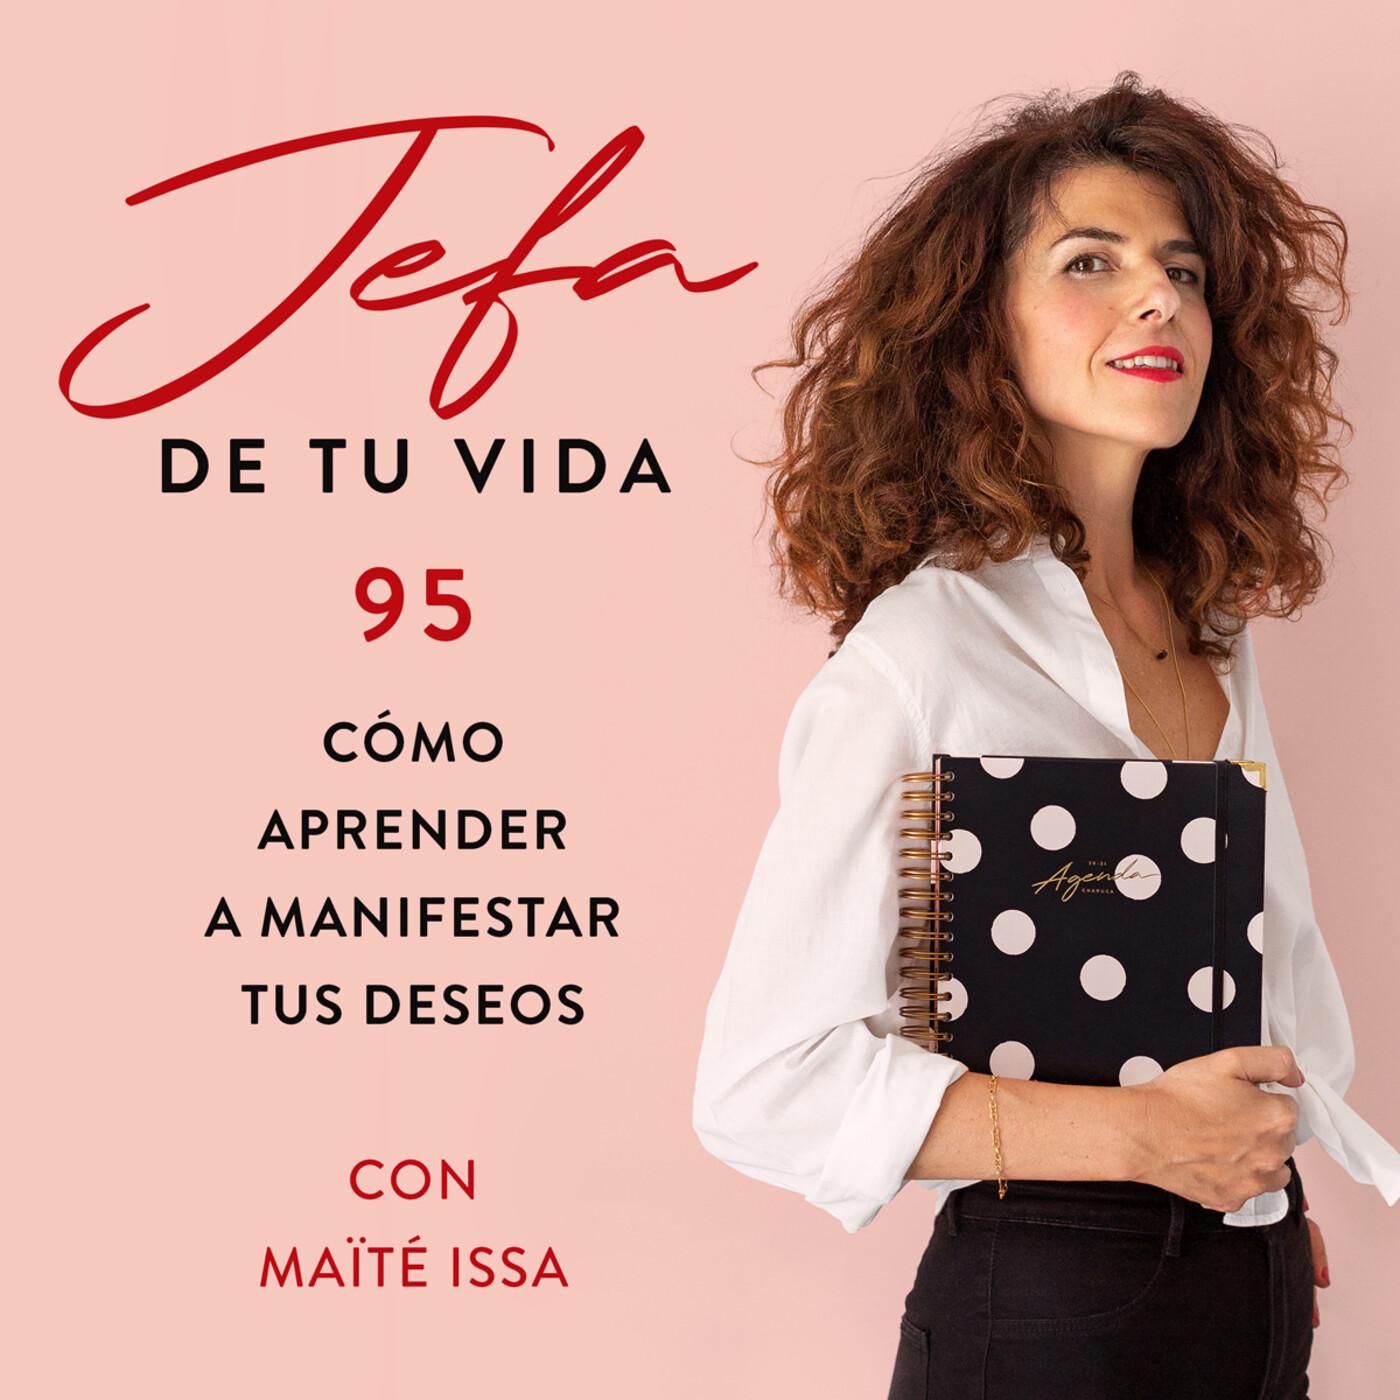 95. Cómo aprender a manifestar tus deseos, con Maité Issa